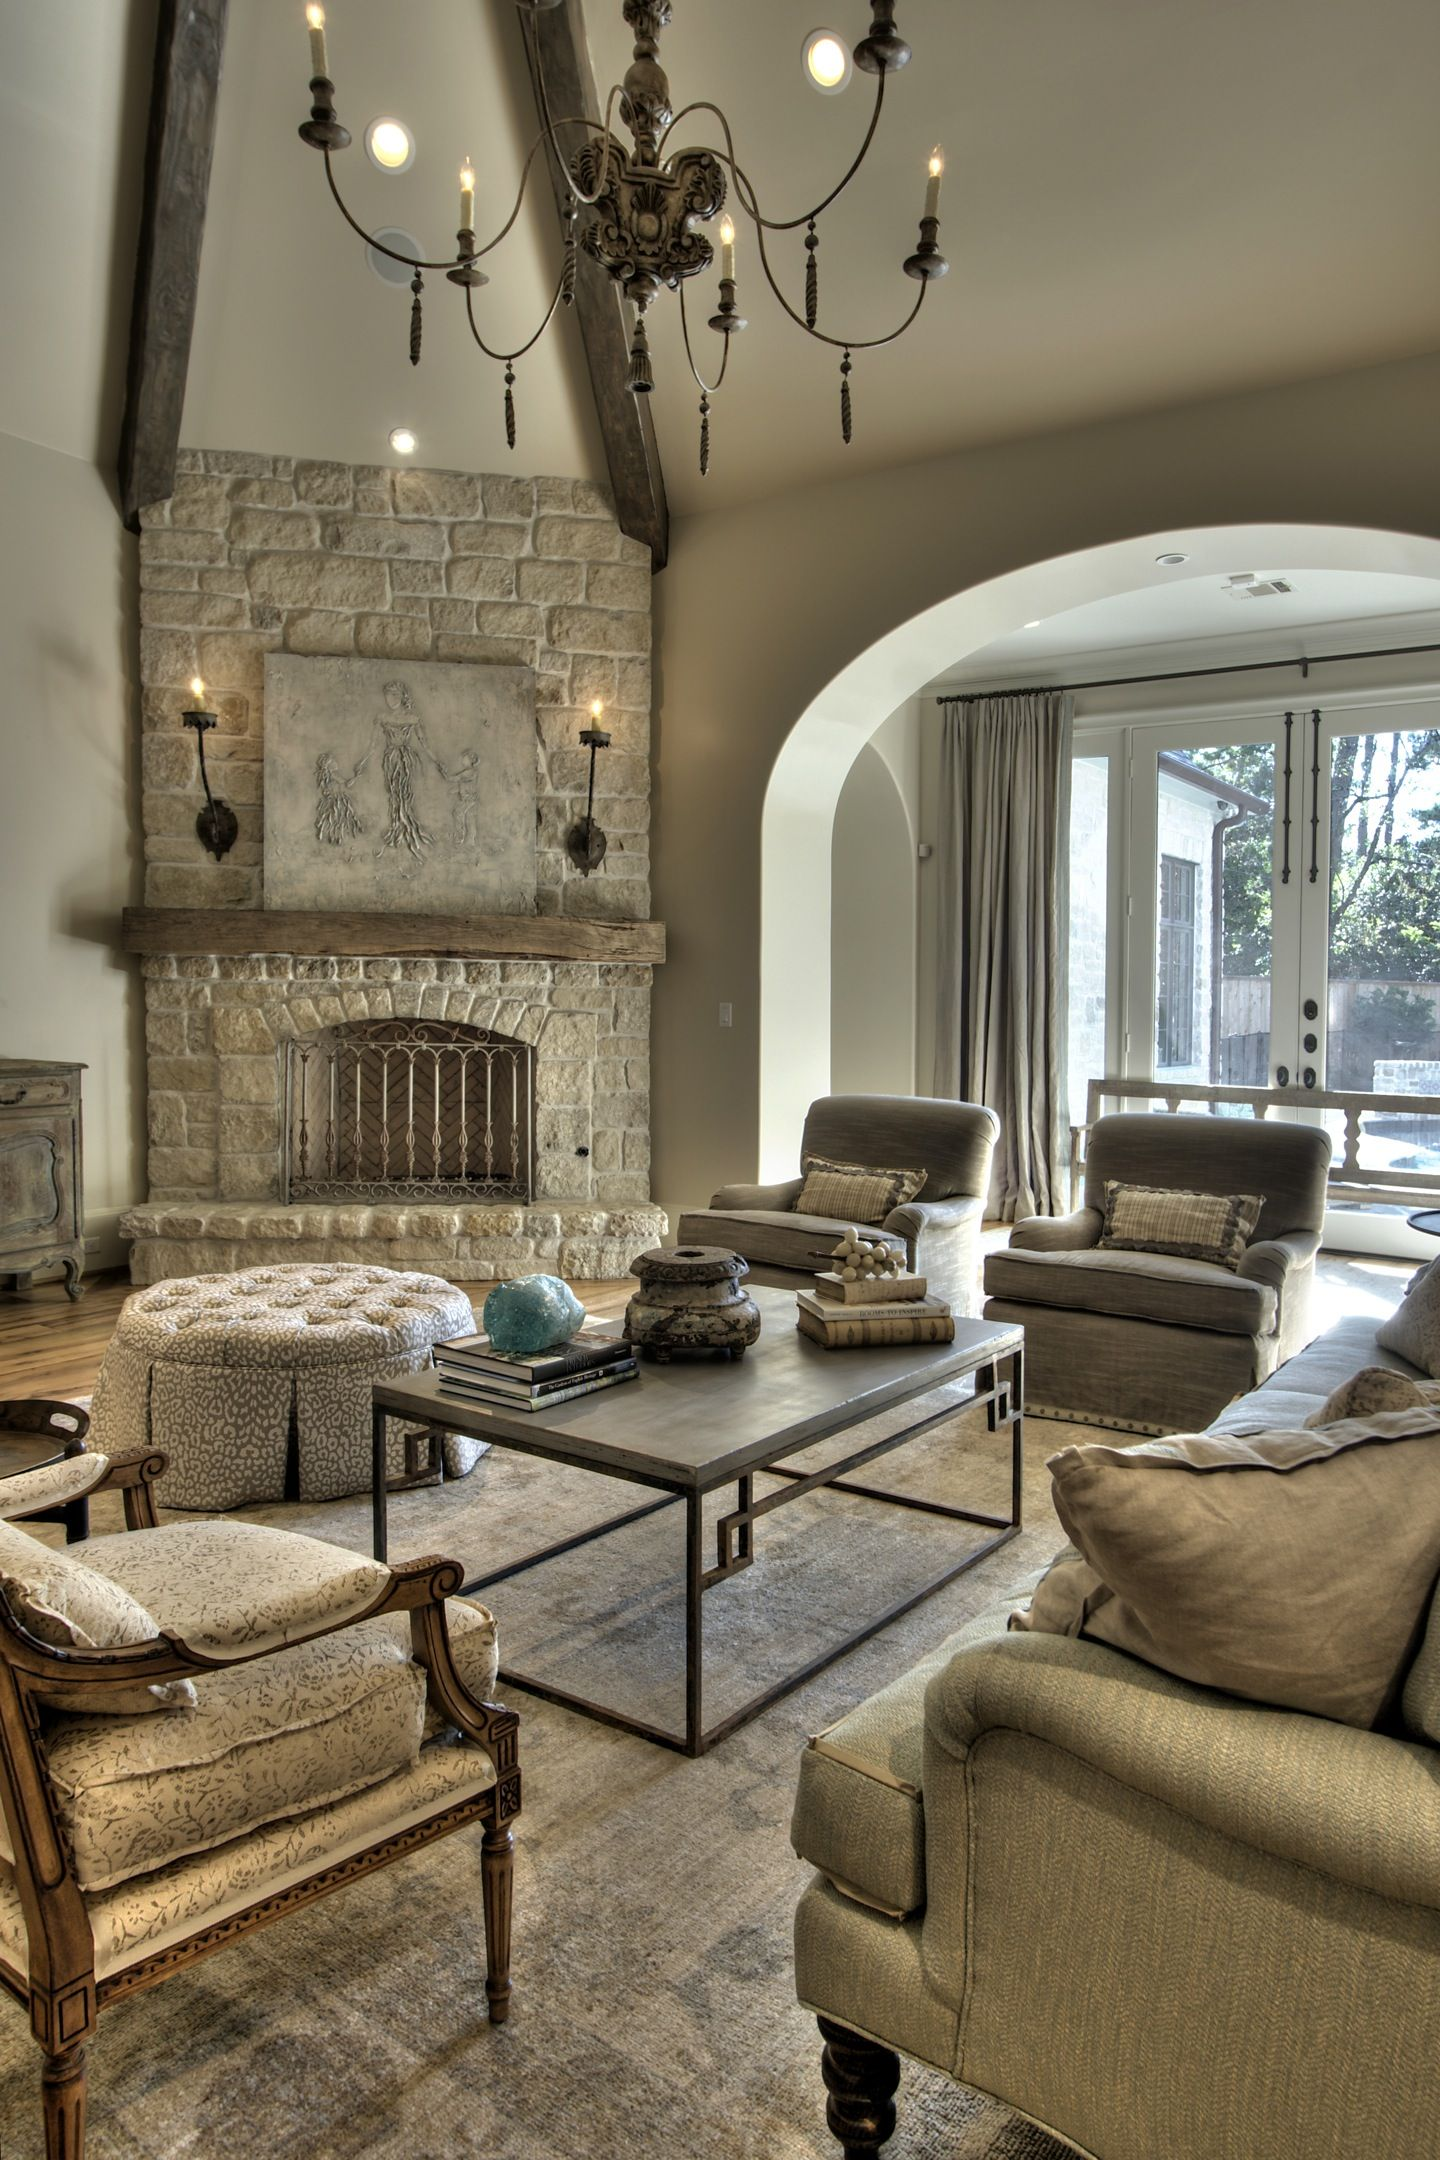 Beautiful Drawing Room: Amazing Fireplace. Don't Like That It's Cornered. I Think